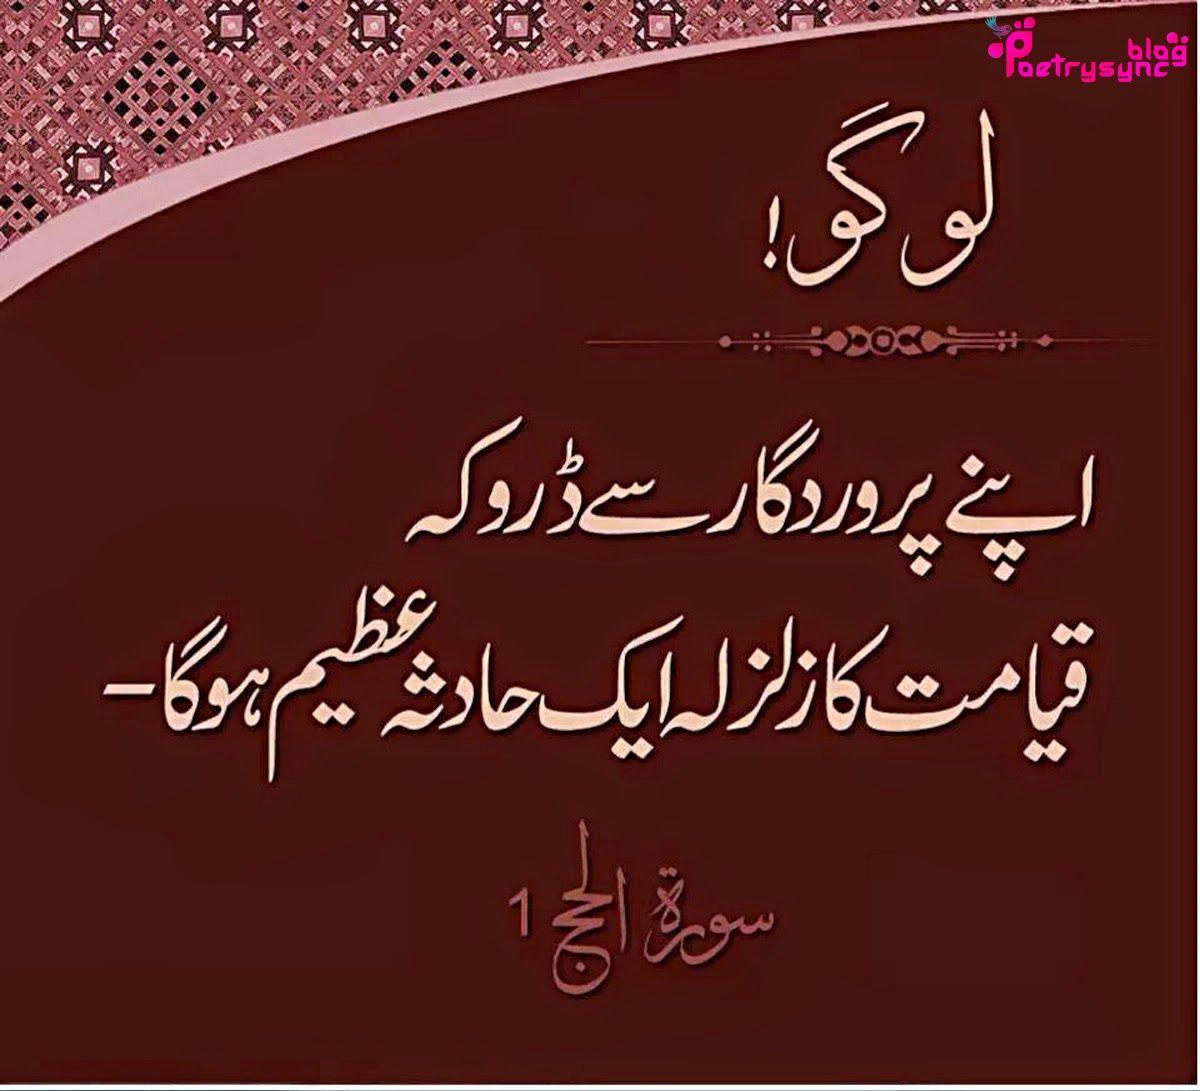 Quotes In Urdu: Poetry: Islamic Dua, Hadees And Quotes In Urdu Pictures